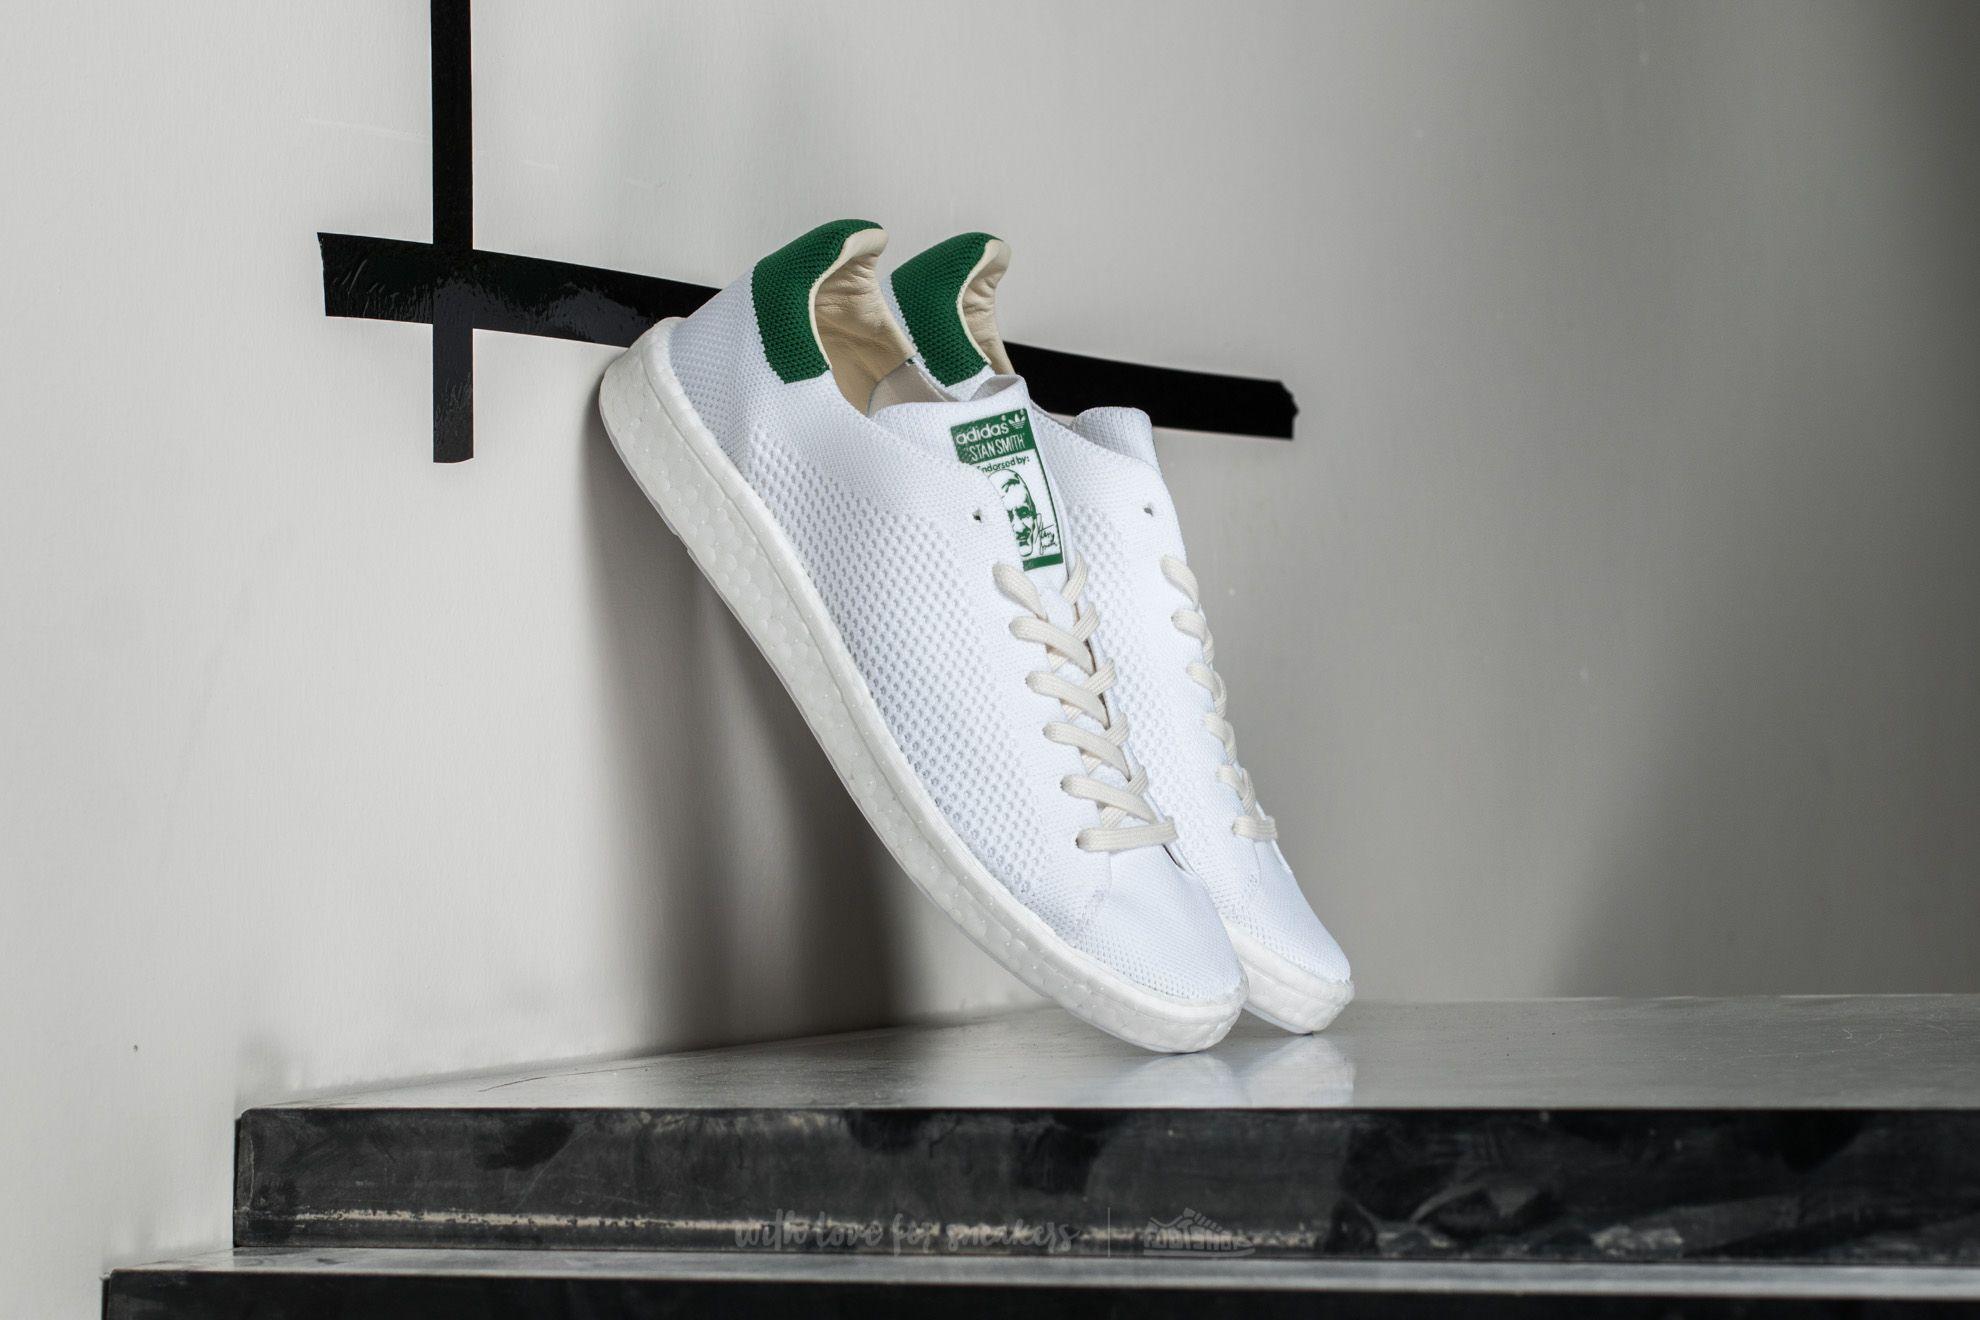 adidas Stan Smith Primeknit Ftw White/ Ftw White/ Green Footshop – FR